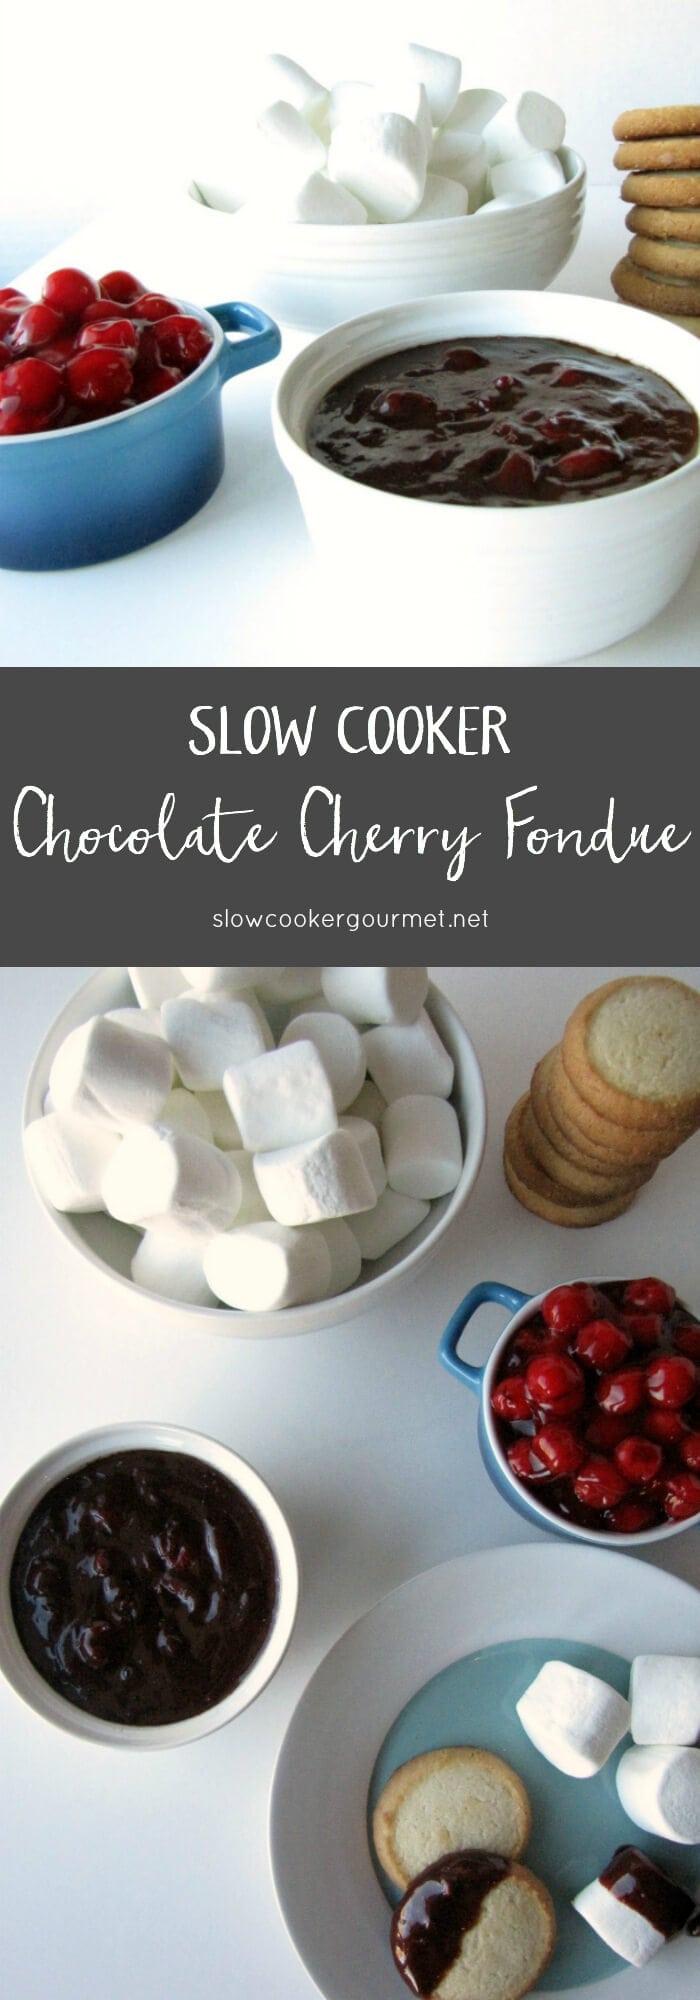 Slow Cooker Gourmet Chocolate Cherry Fondue